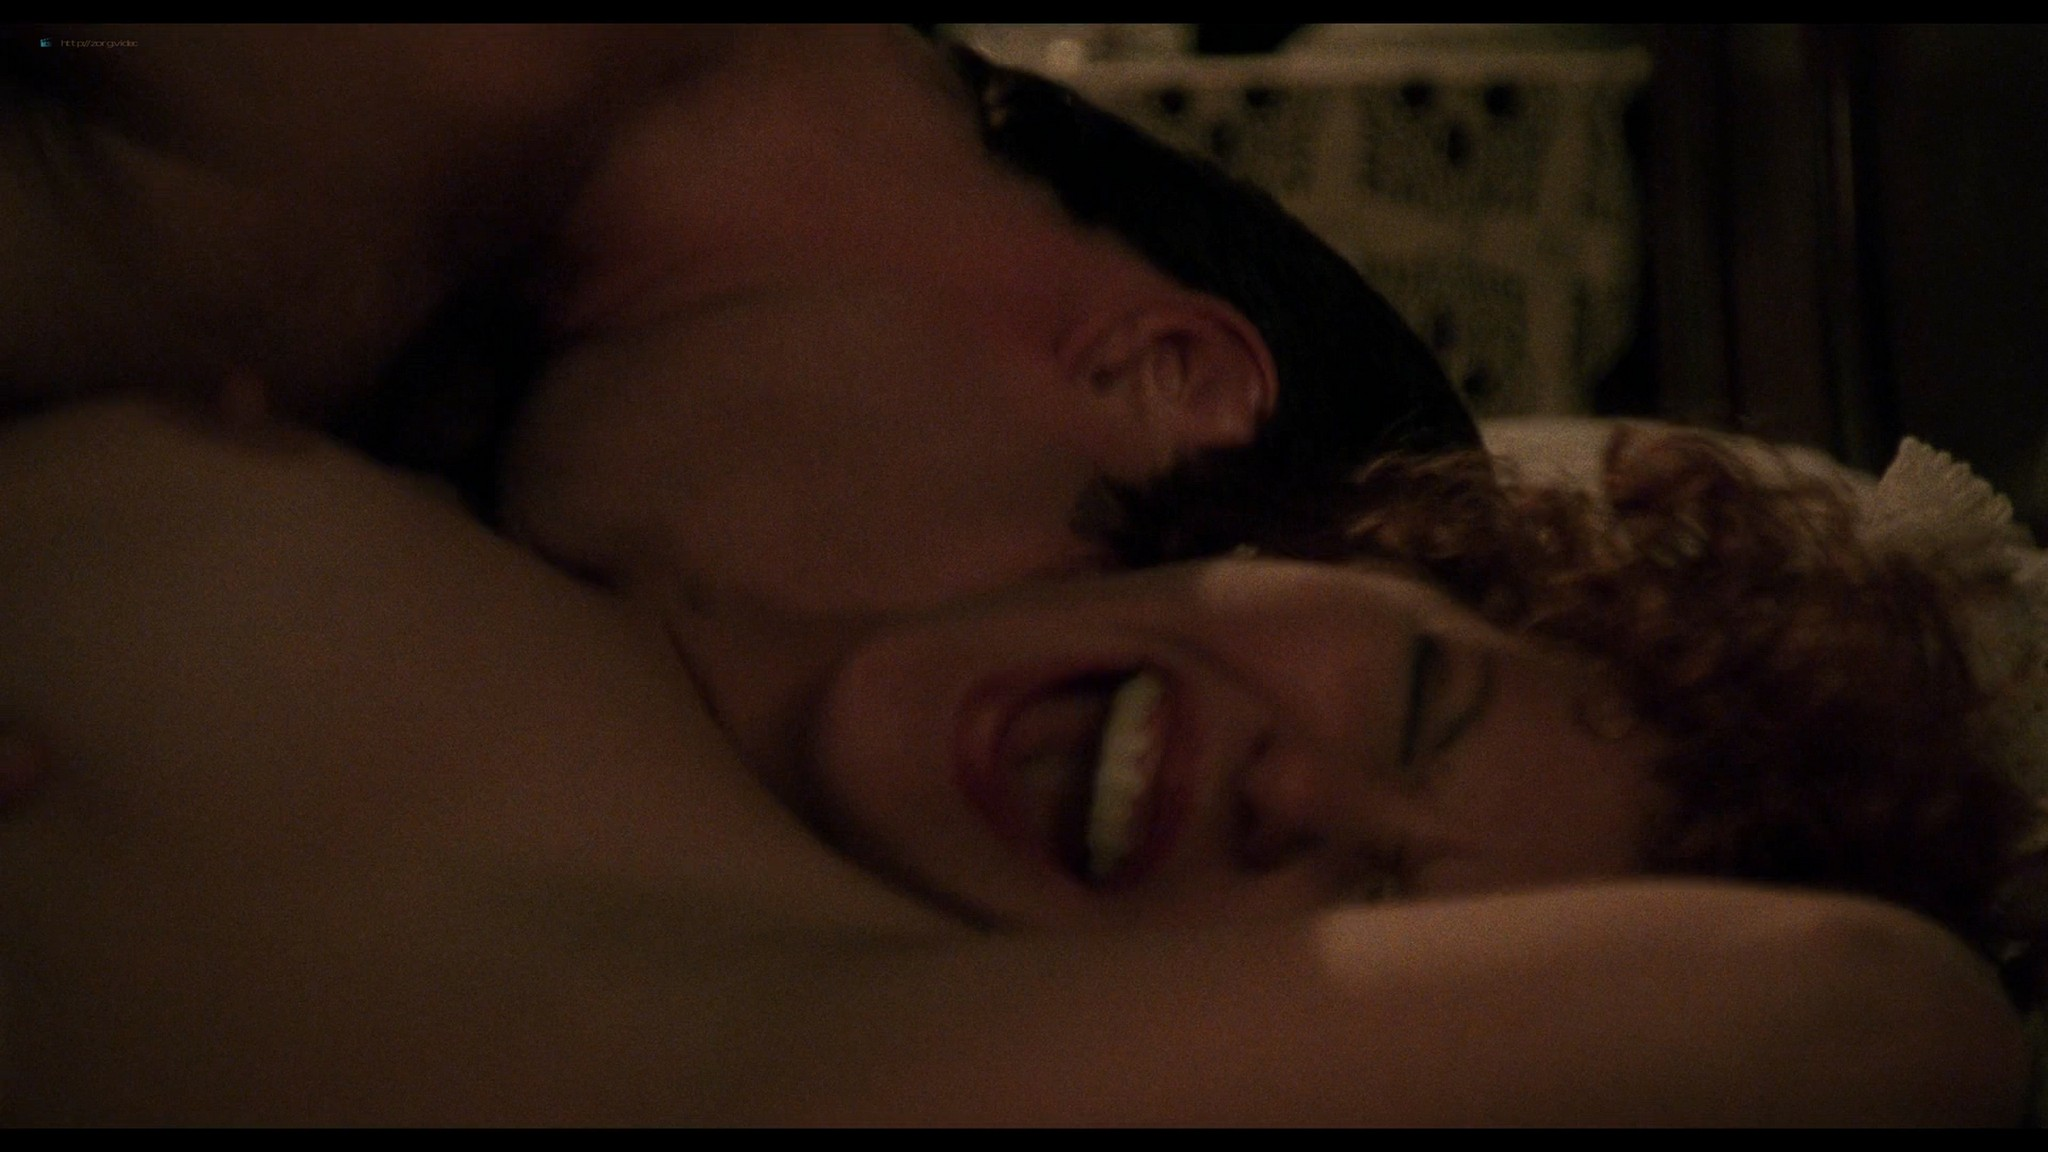 Jennifer Delora nude hot sex - Deadly Manor (1990) HD 1080p BluRay (3)